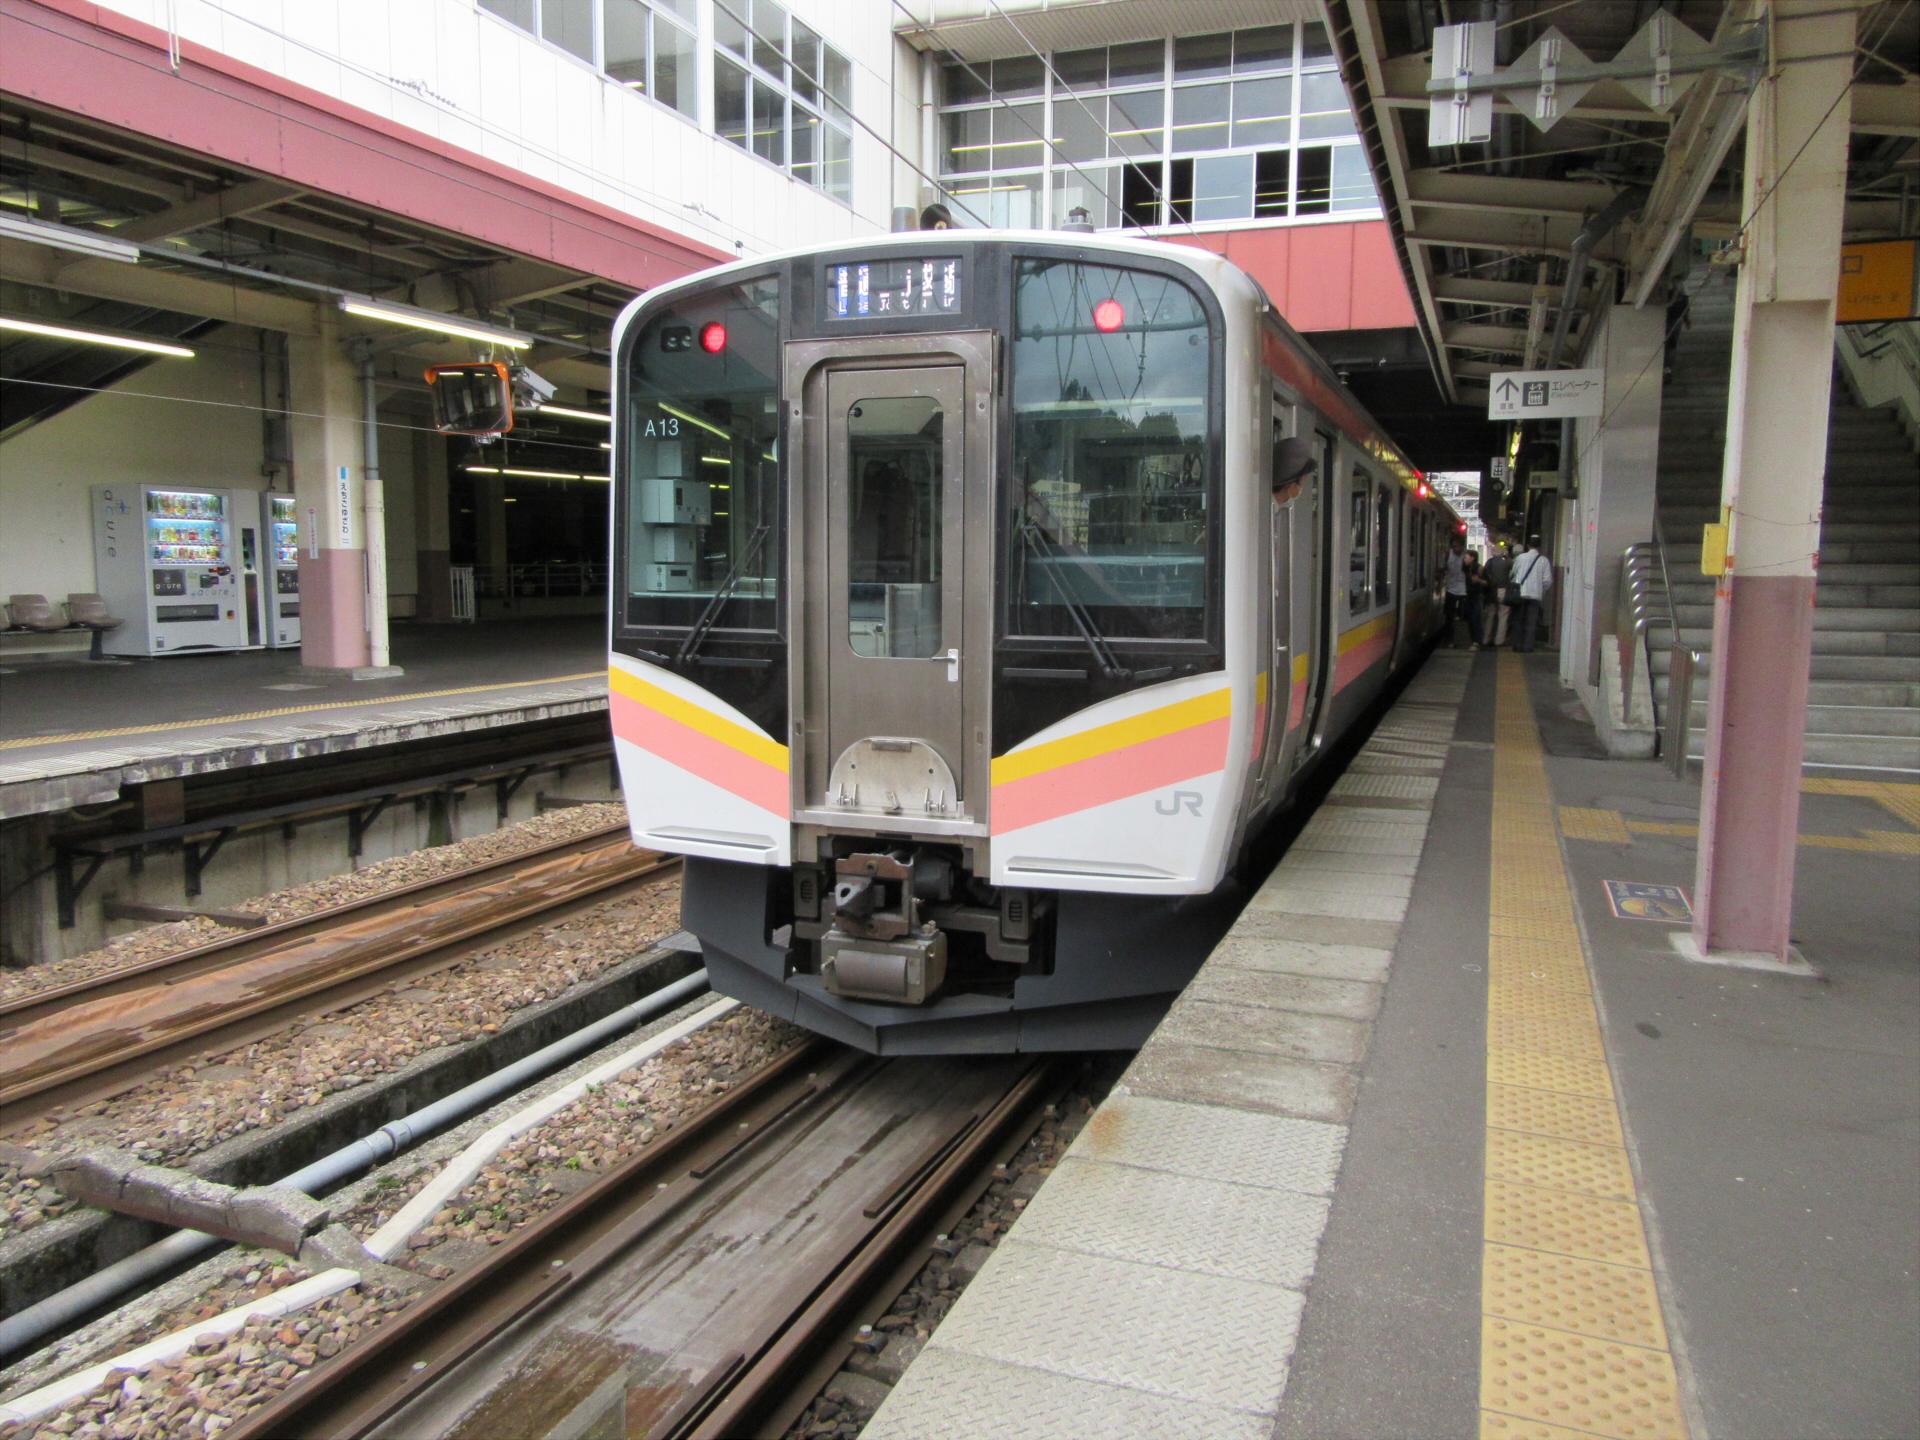 【画像】越後湯沢駅に停車中の上越線(長岡行き)